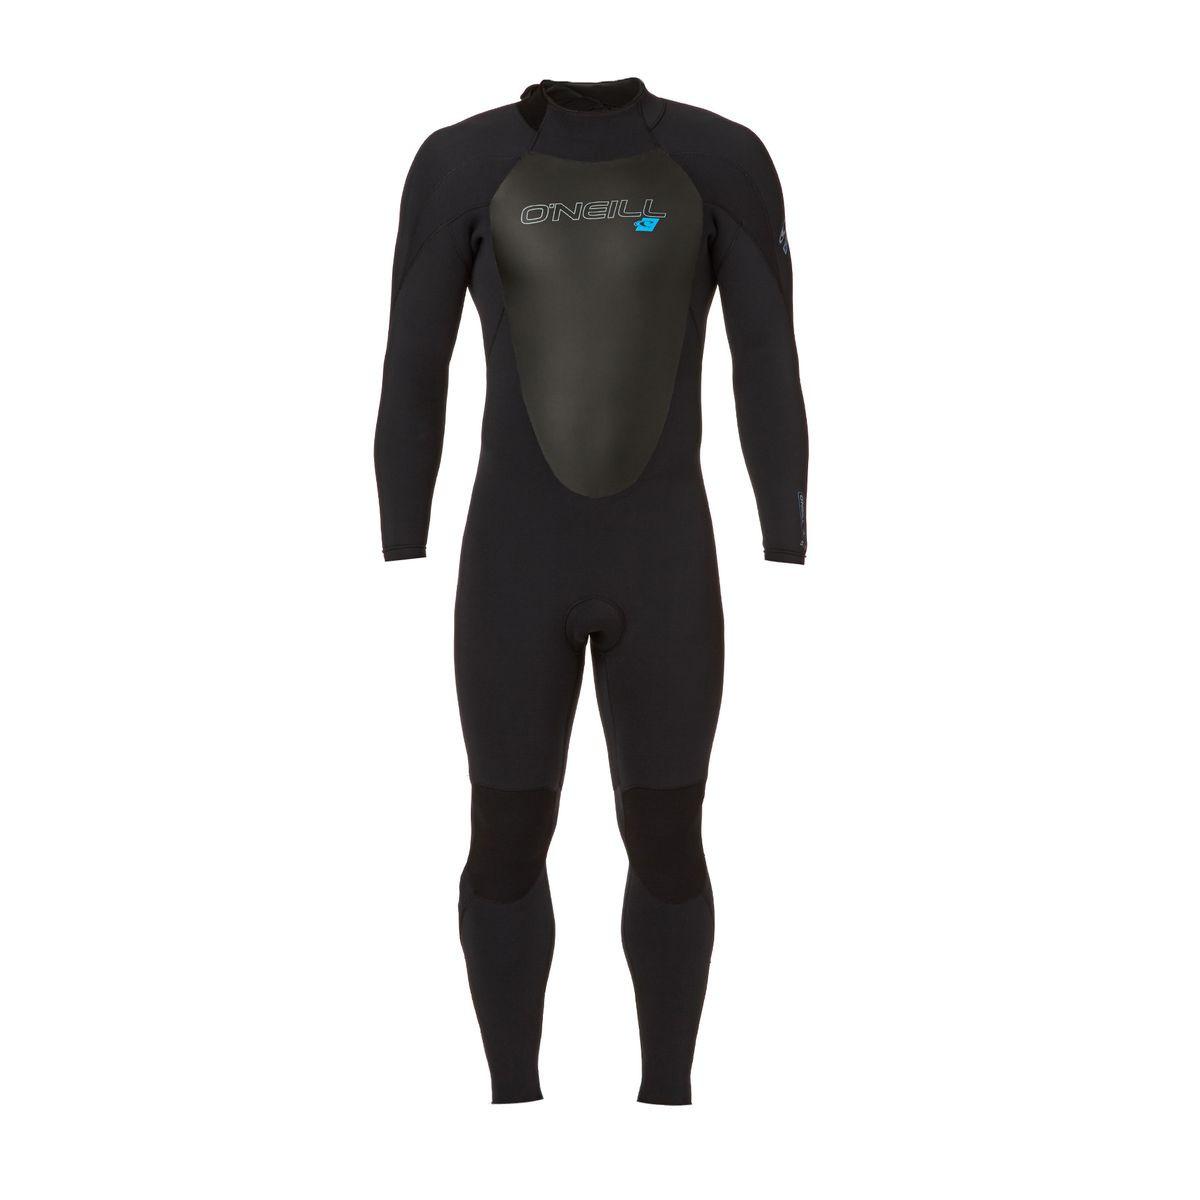 O'Neill Epic 5/4mm Back Zip Wetsuit - Black/ Black/ Black